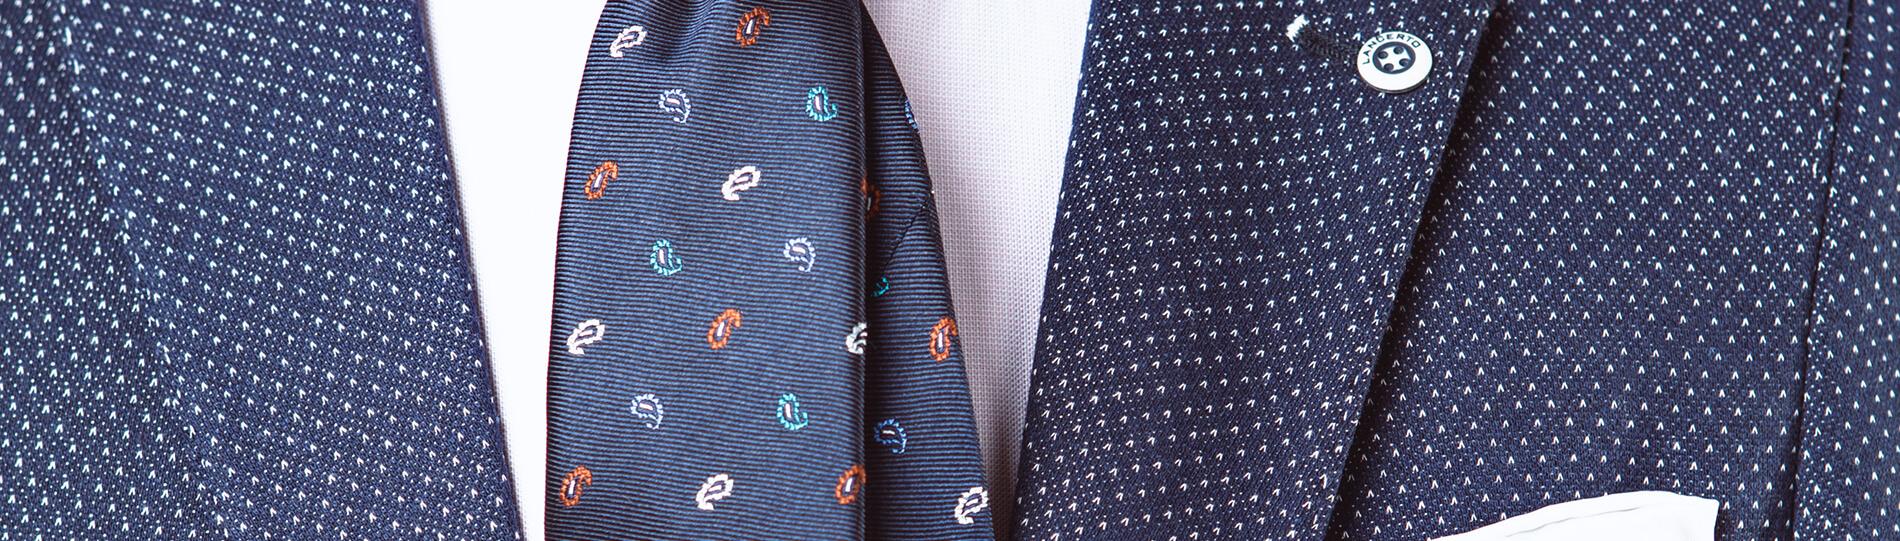 4d1d9b18c857a Garnitur: podstawowe kolory. Jakie buty i krawat dobrać do garnituru